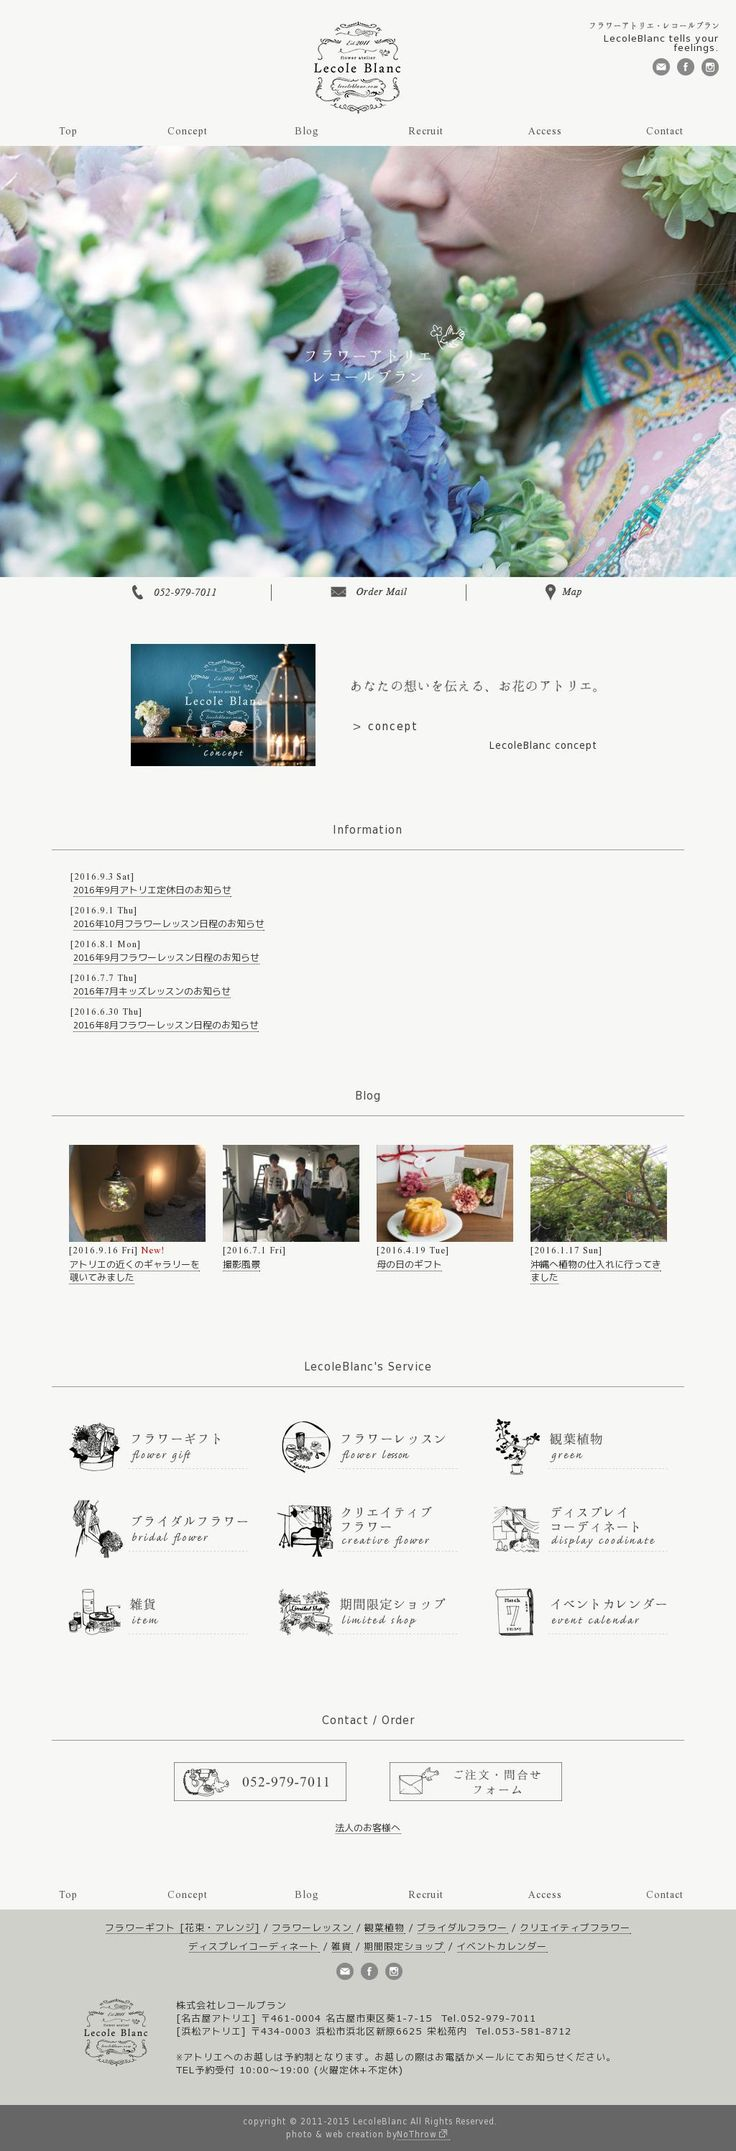 The website 'http://lecoleblanc.com/' courtesy of @Pinstamatic…